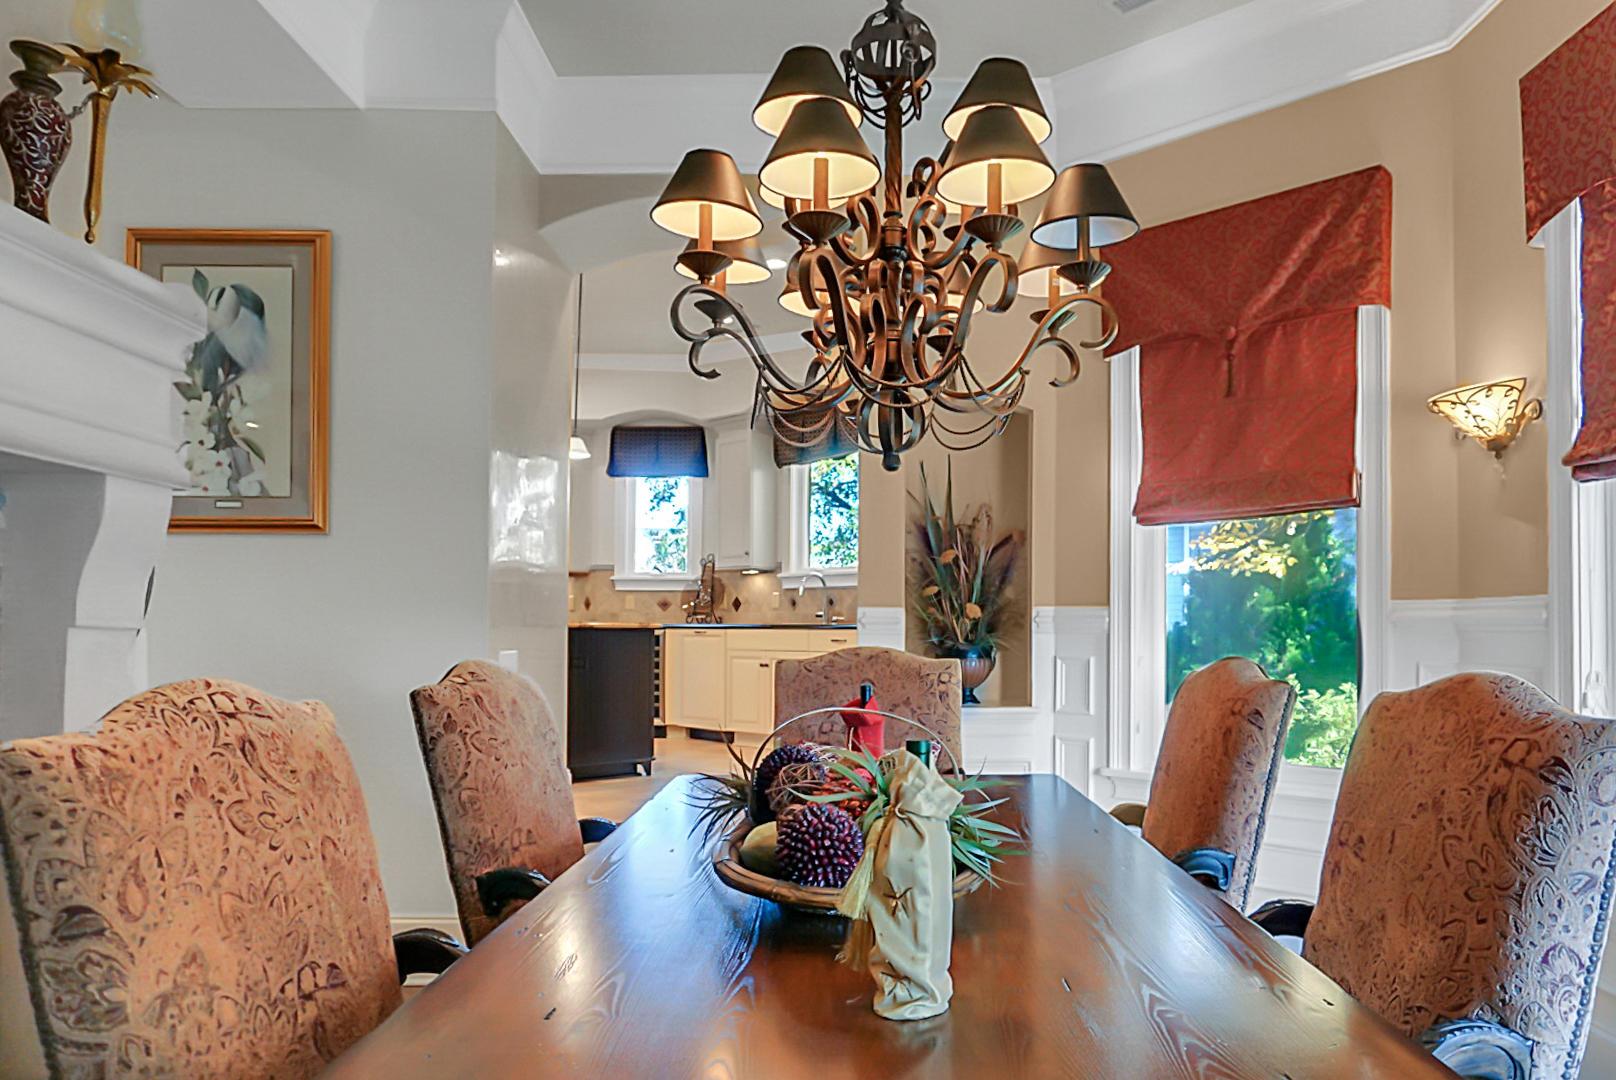 Dunes West Homes For Sale - 2389 Darts Cove, Mount Pleasant, SC - 39